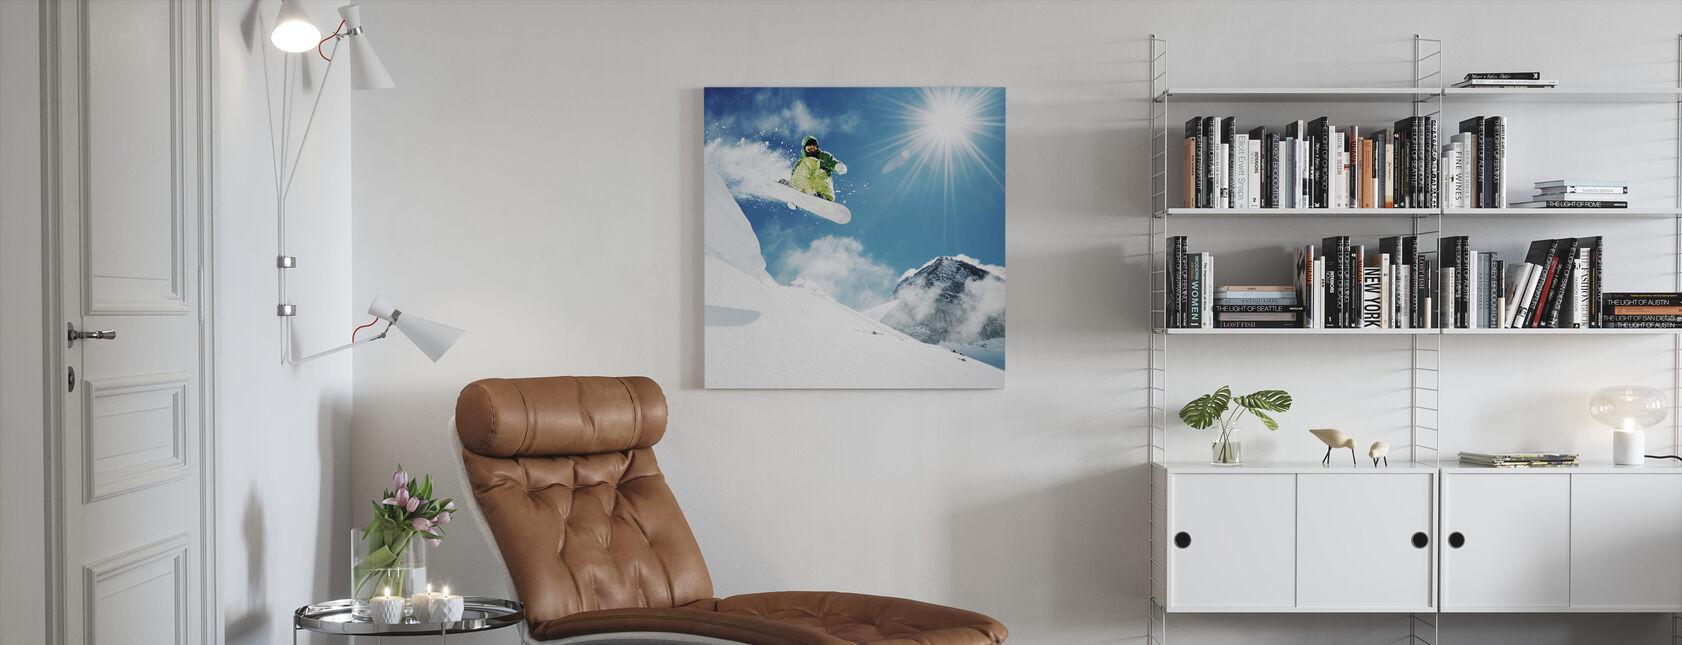 Snowboarder at Jump - Canvas print - Living Room